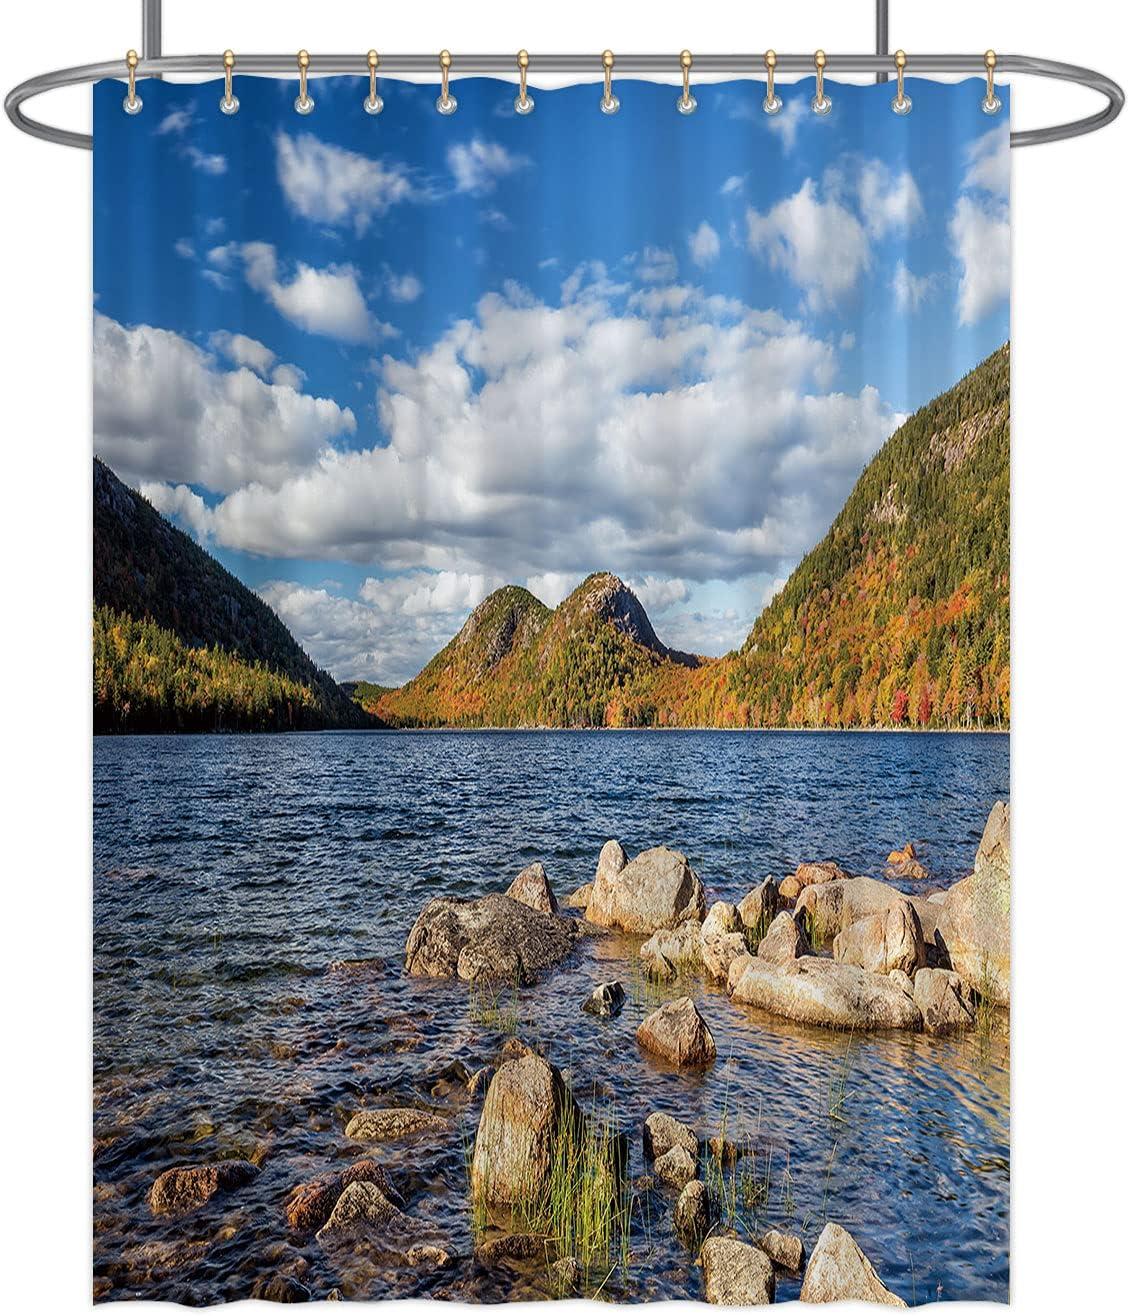 Jordan Pond in Acadia National Durable Gorgeous Curtain Regular discount Shower Park Maine